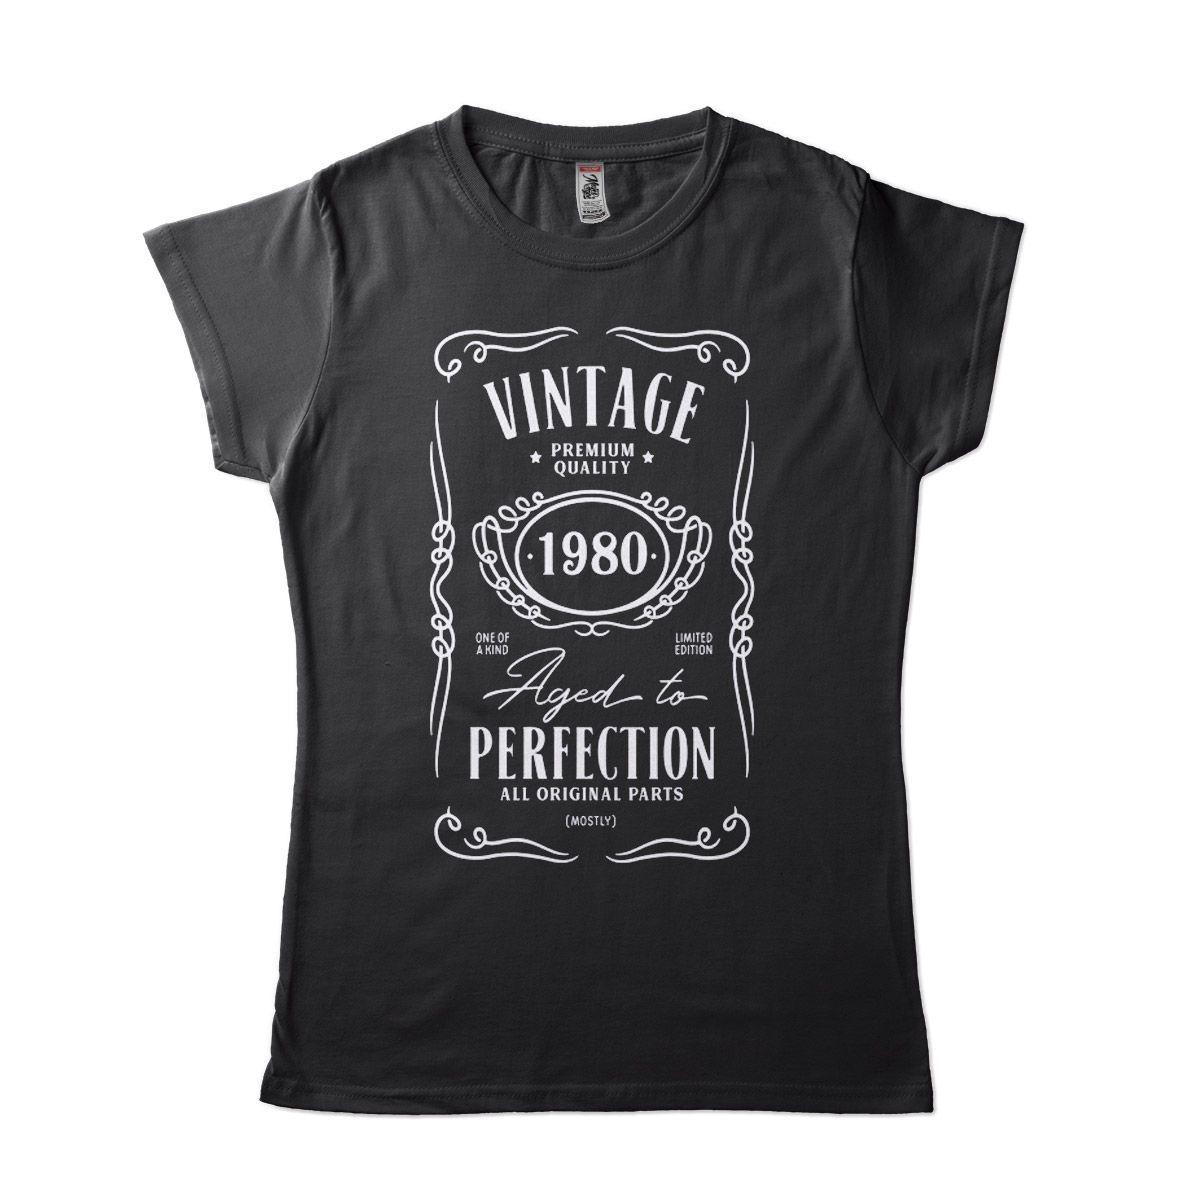 ideia de presente de aniversario camiseta com data personalizada